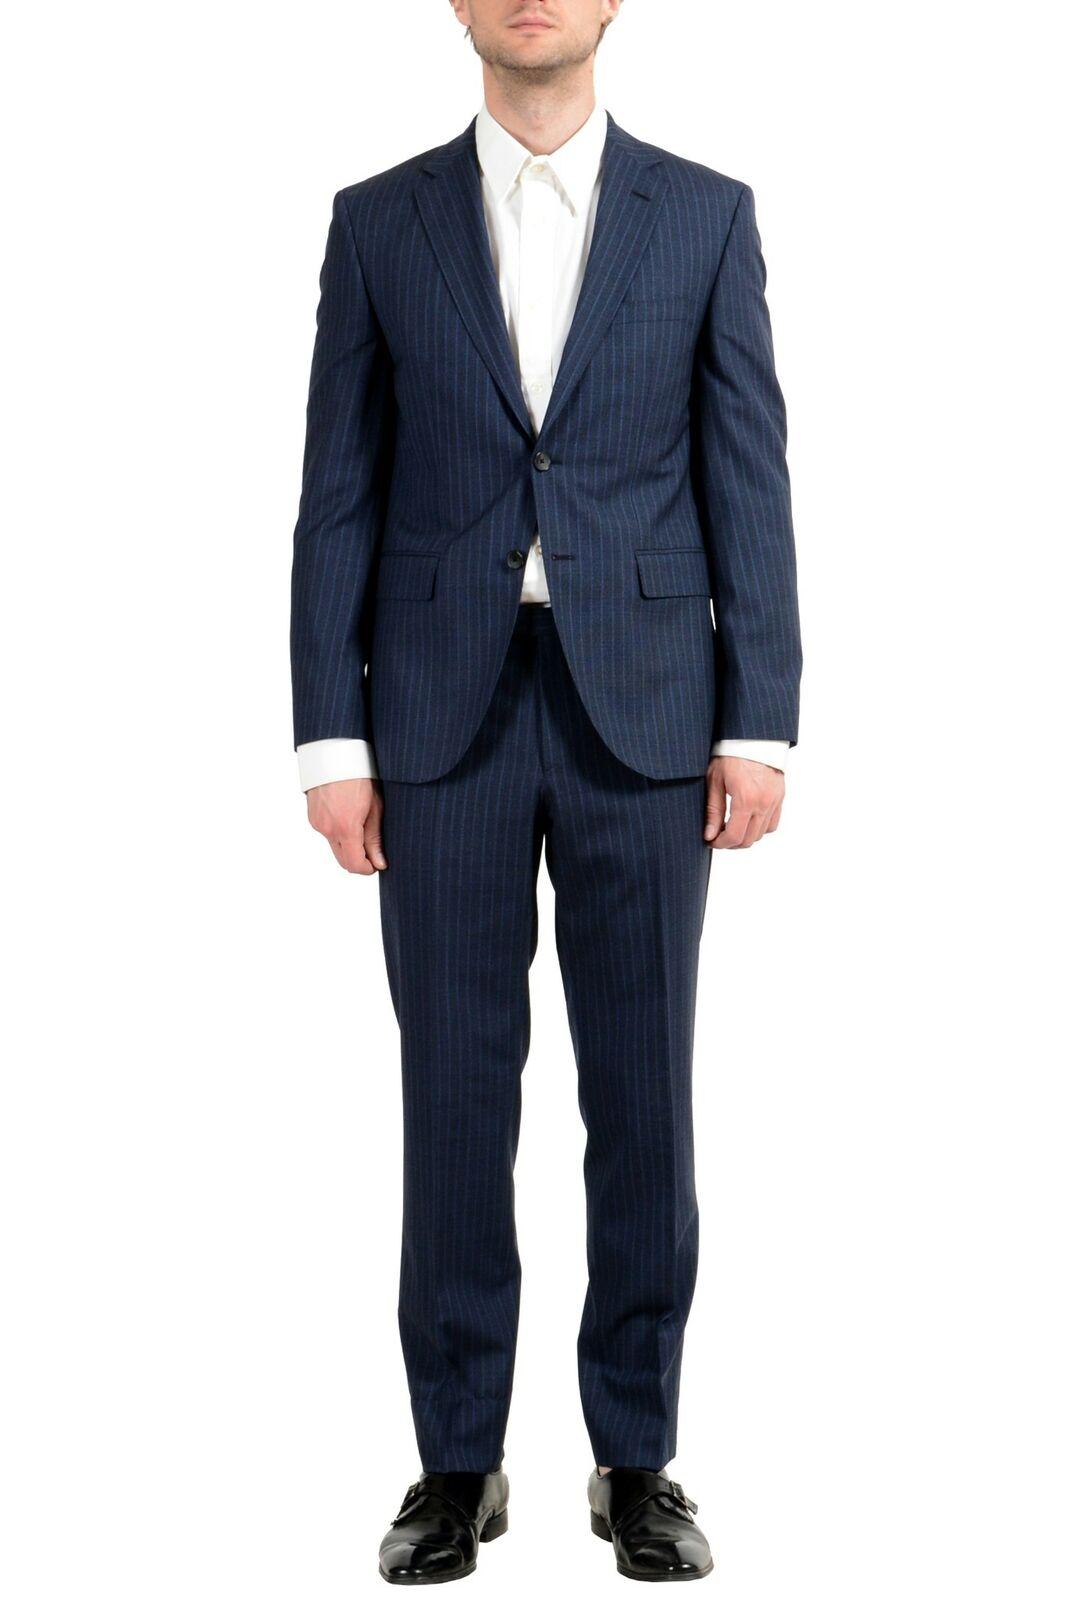 Hugo Boss  Johnstons5 Lenon1  Men's 100% Wool bluee Striped Two Button Suit